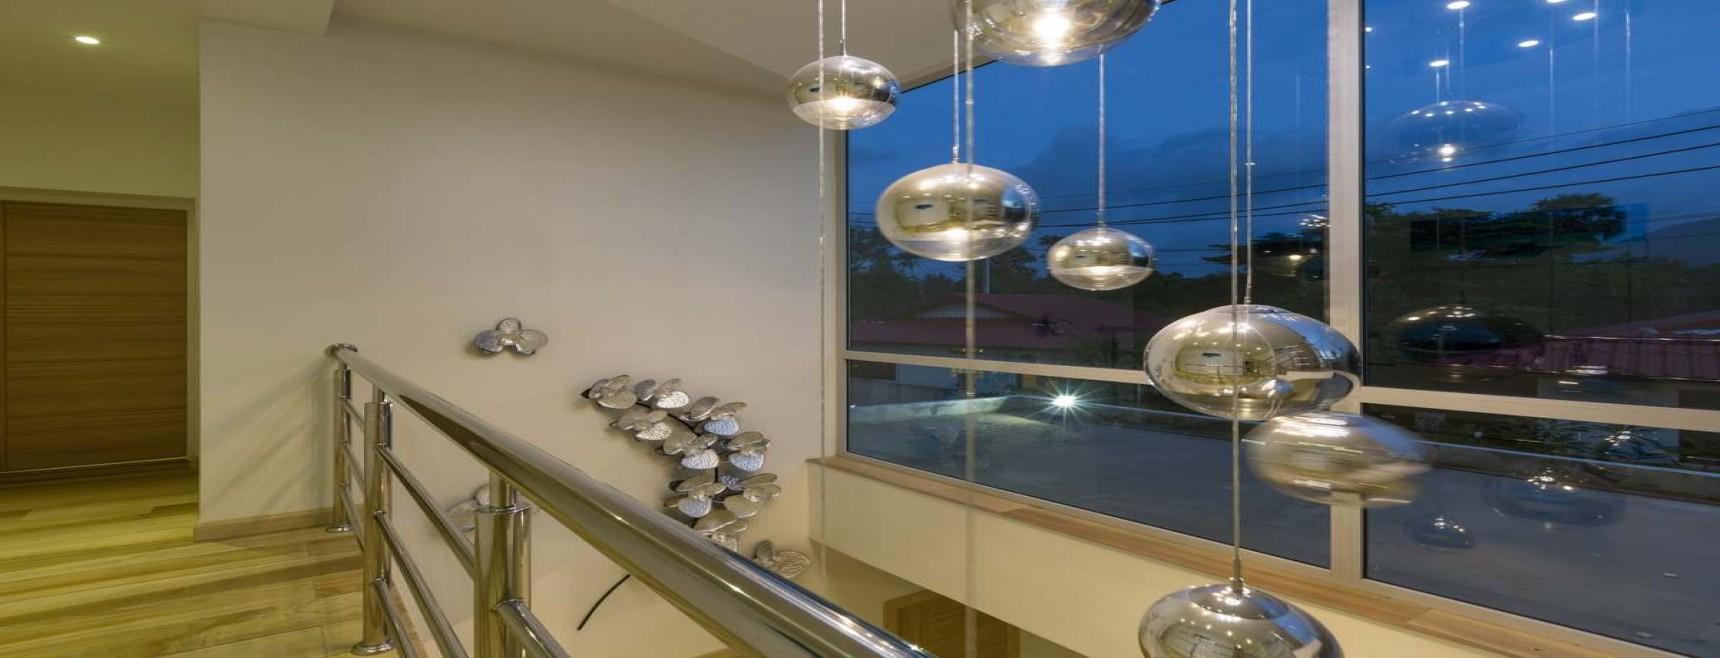 5 Bedrooms, Villa, Residential Sales, 5 Bathrooms, Listing ID 1352, Koh Samui,